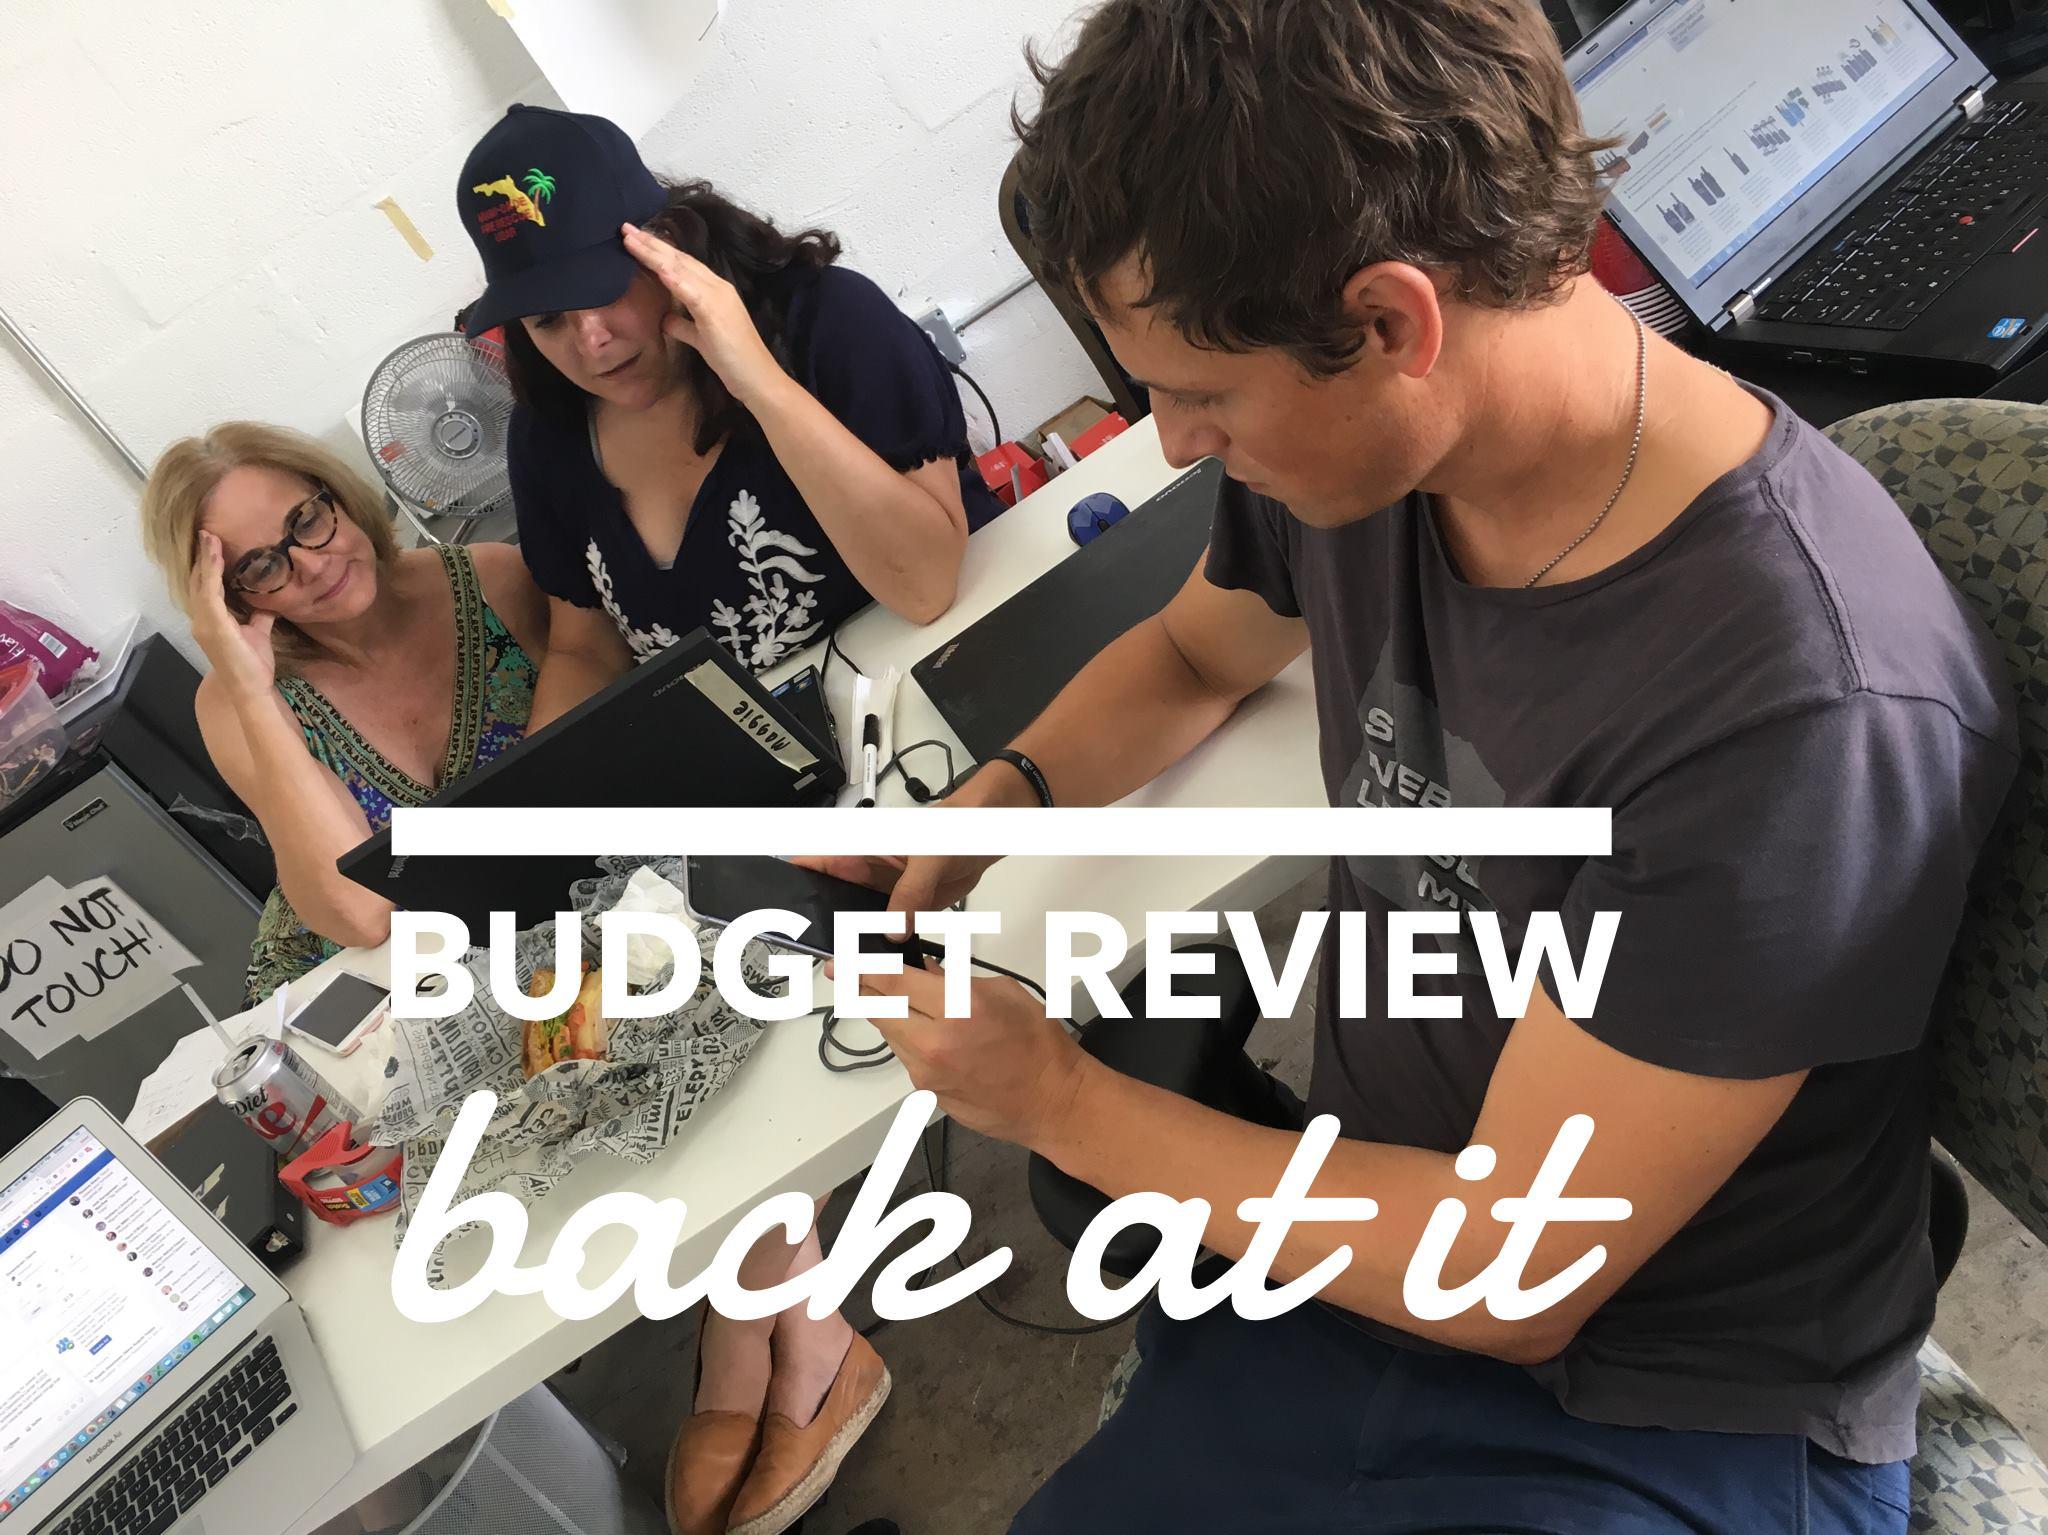 Blog-Budget-Review-4.jpg